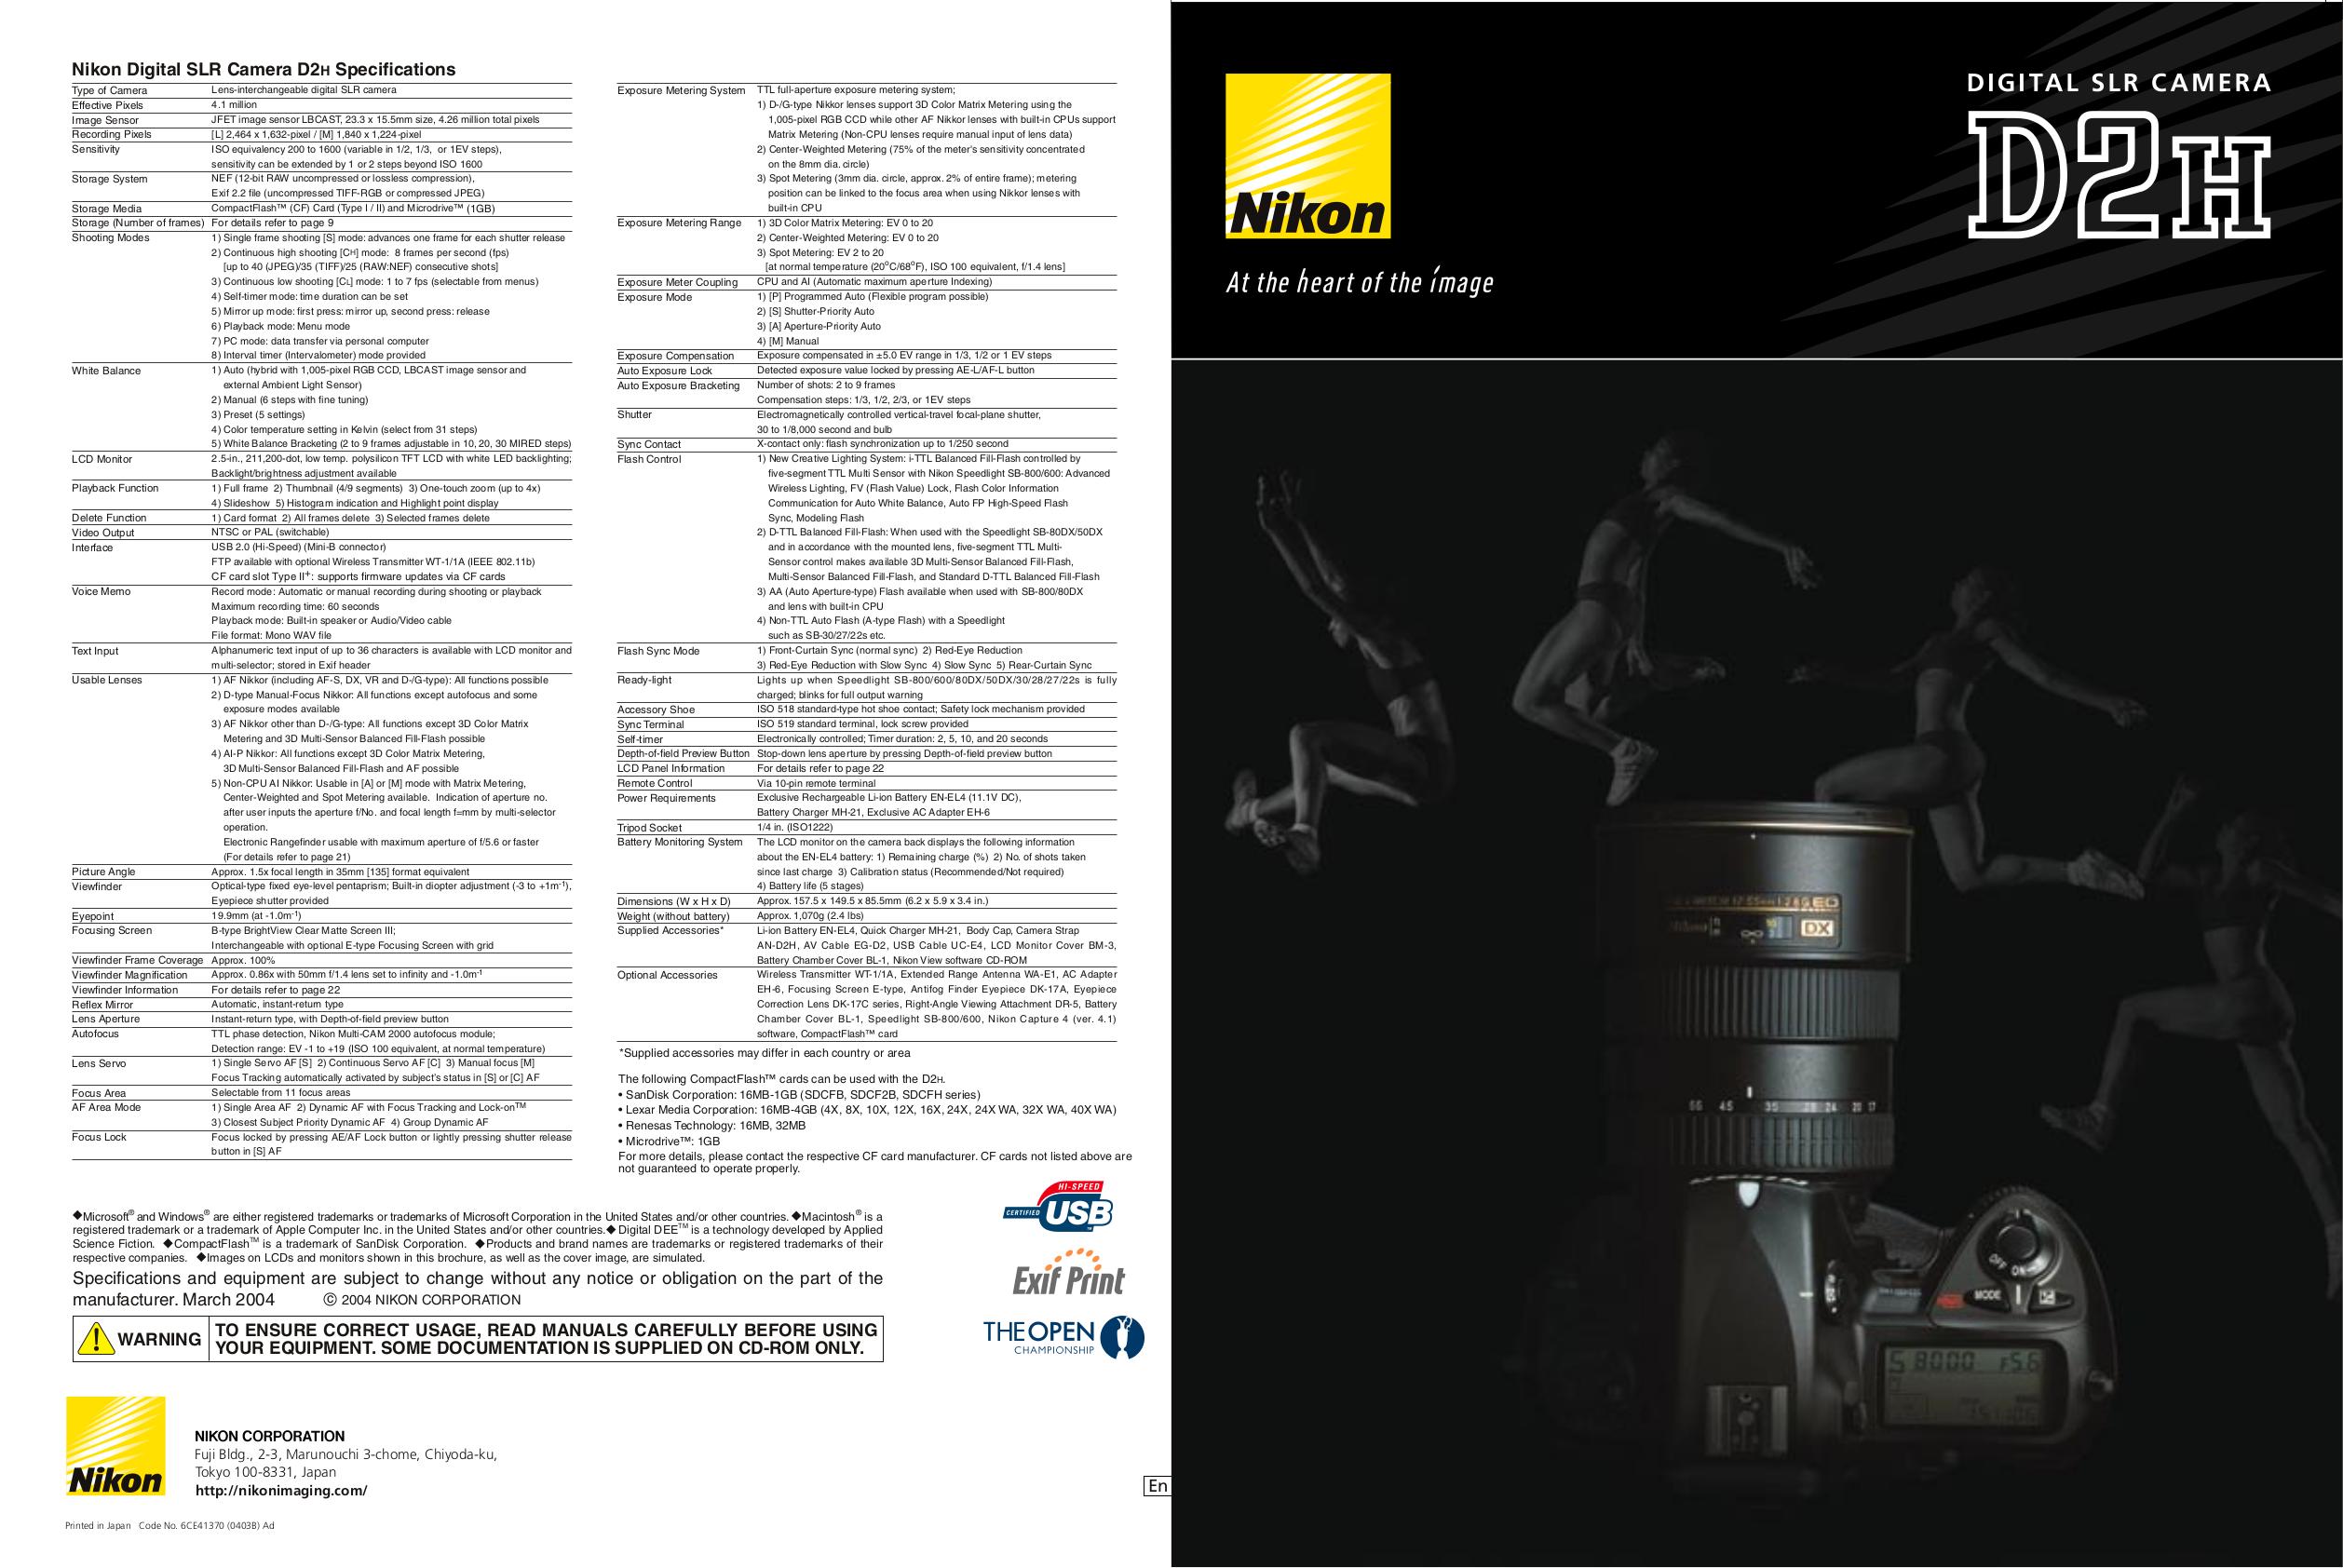 Free pdf manual download for the nikon d2h digital camera slr.